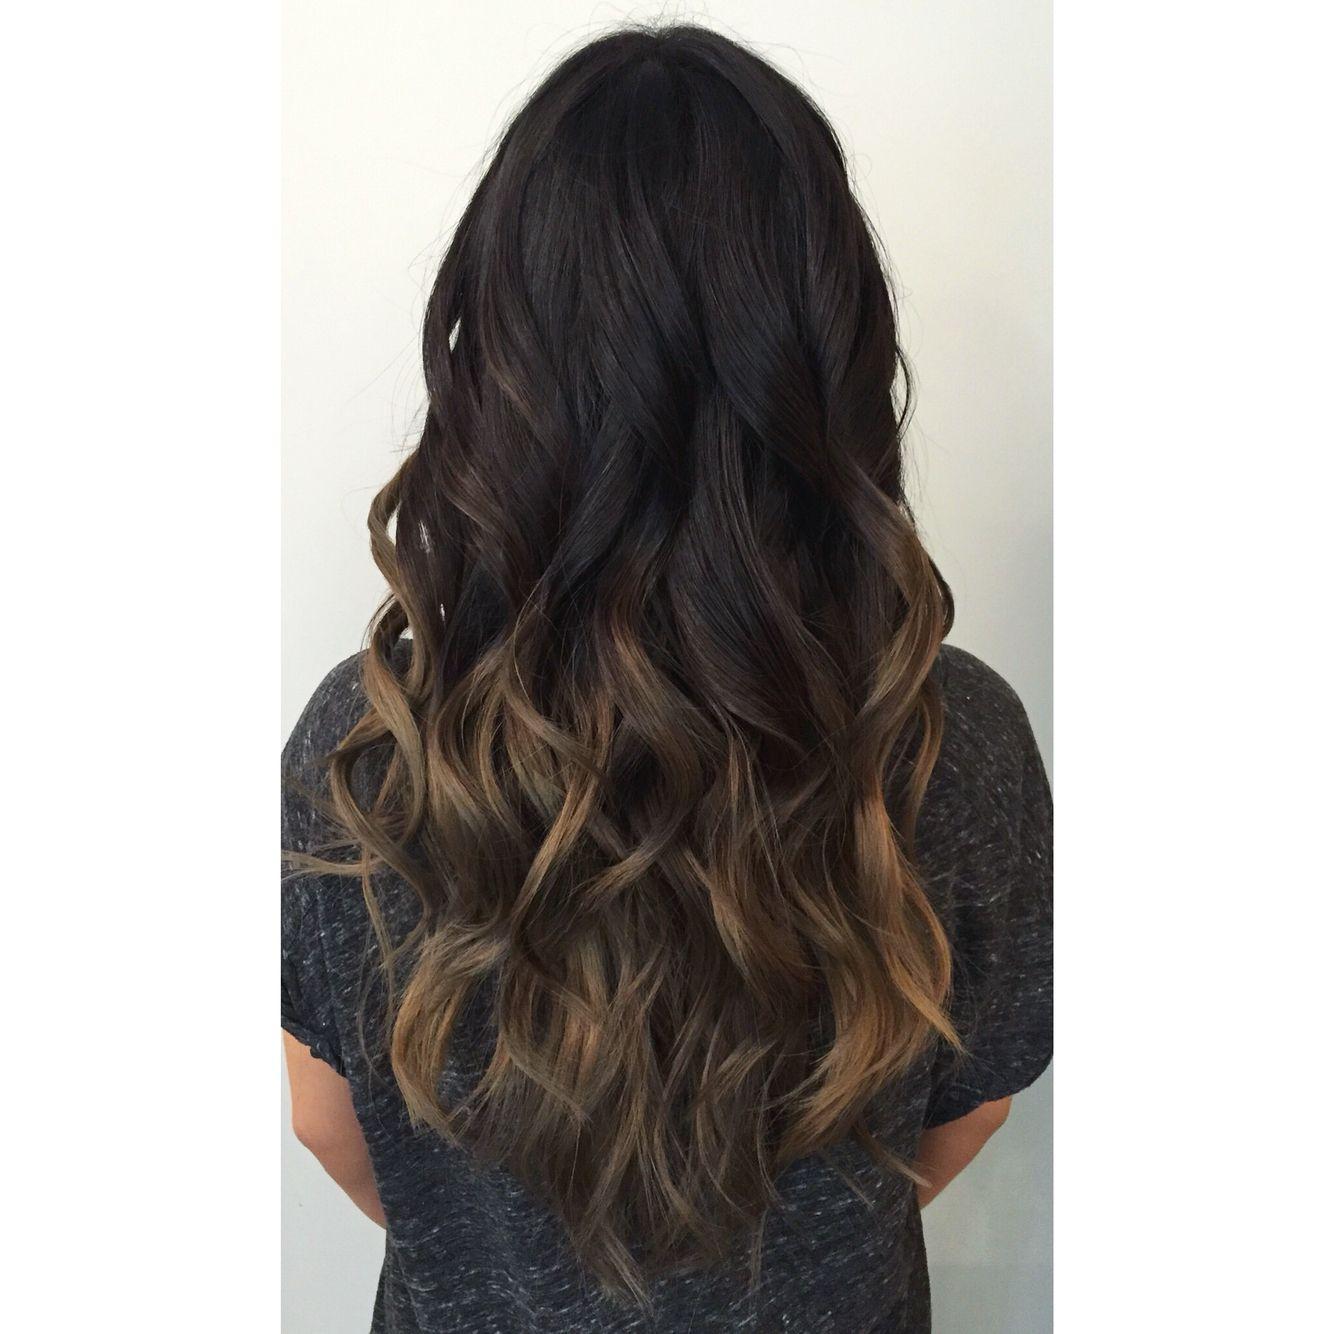 By Hollylikeshair In Portland Or At Blueprint Modern Hair Beach Waves Balayage Blonde Highlights Ash Bru Modern Hairstyles Long Hair Styles Hair Styles